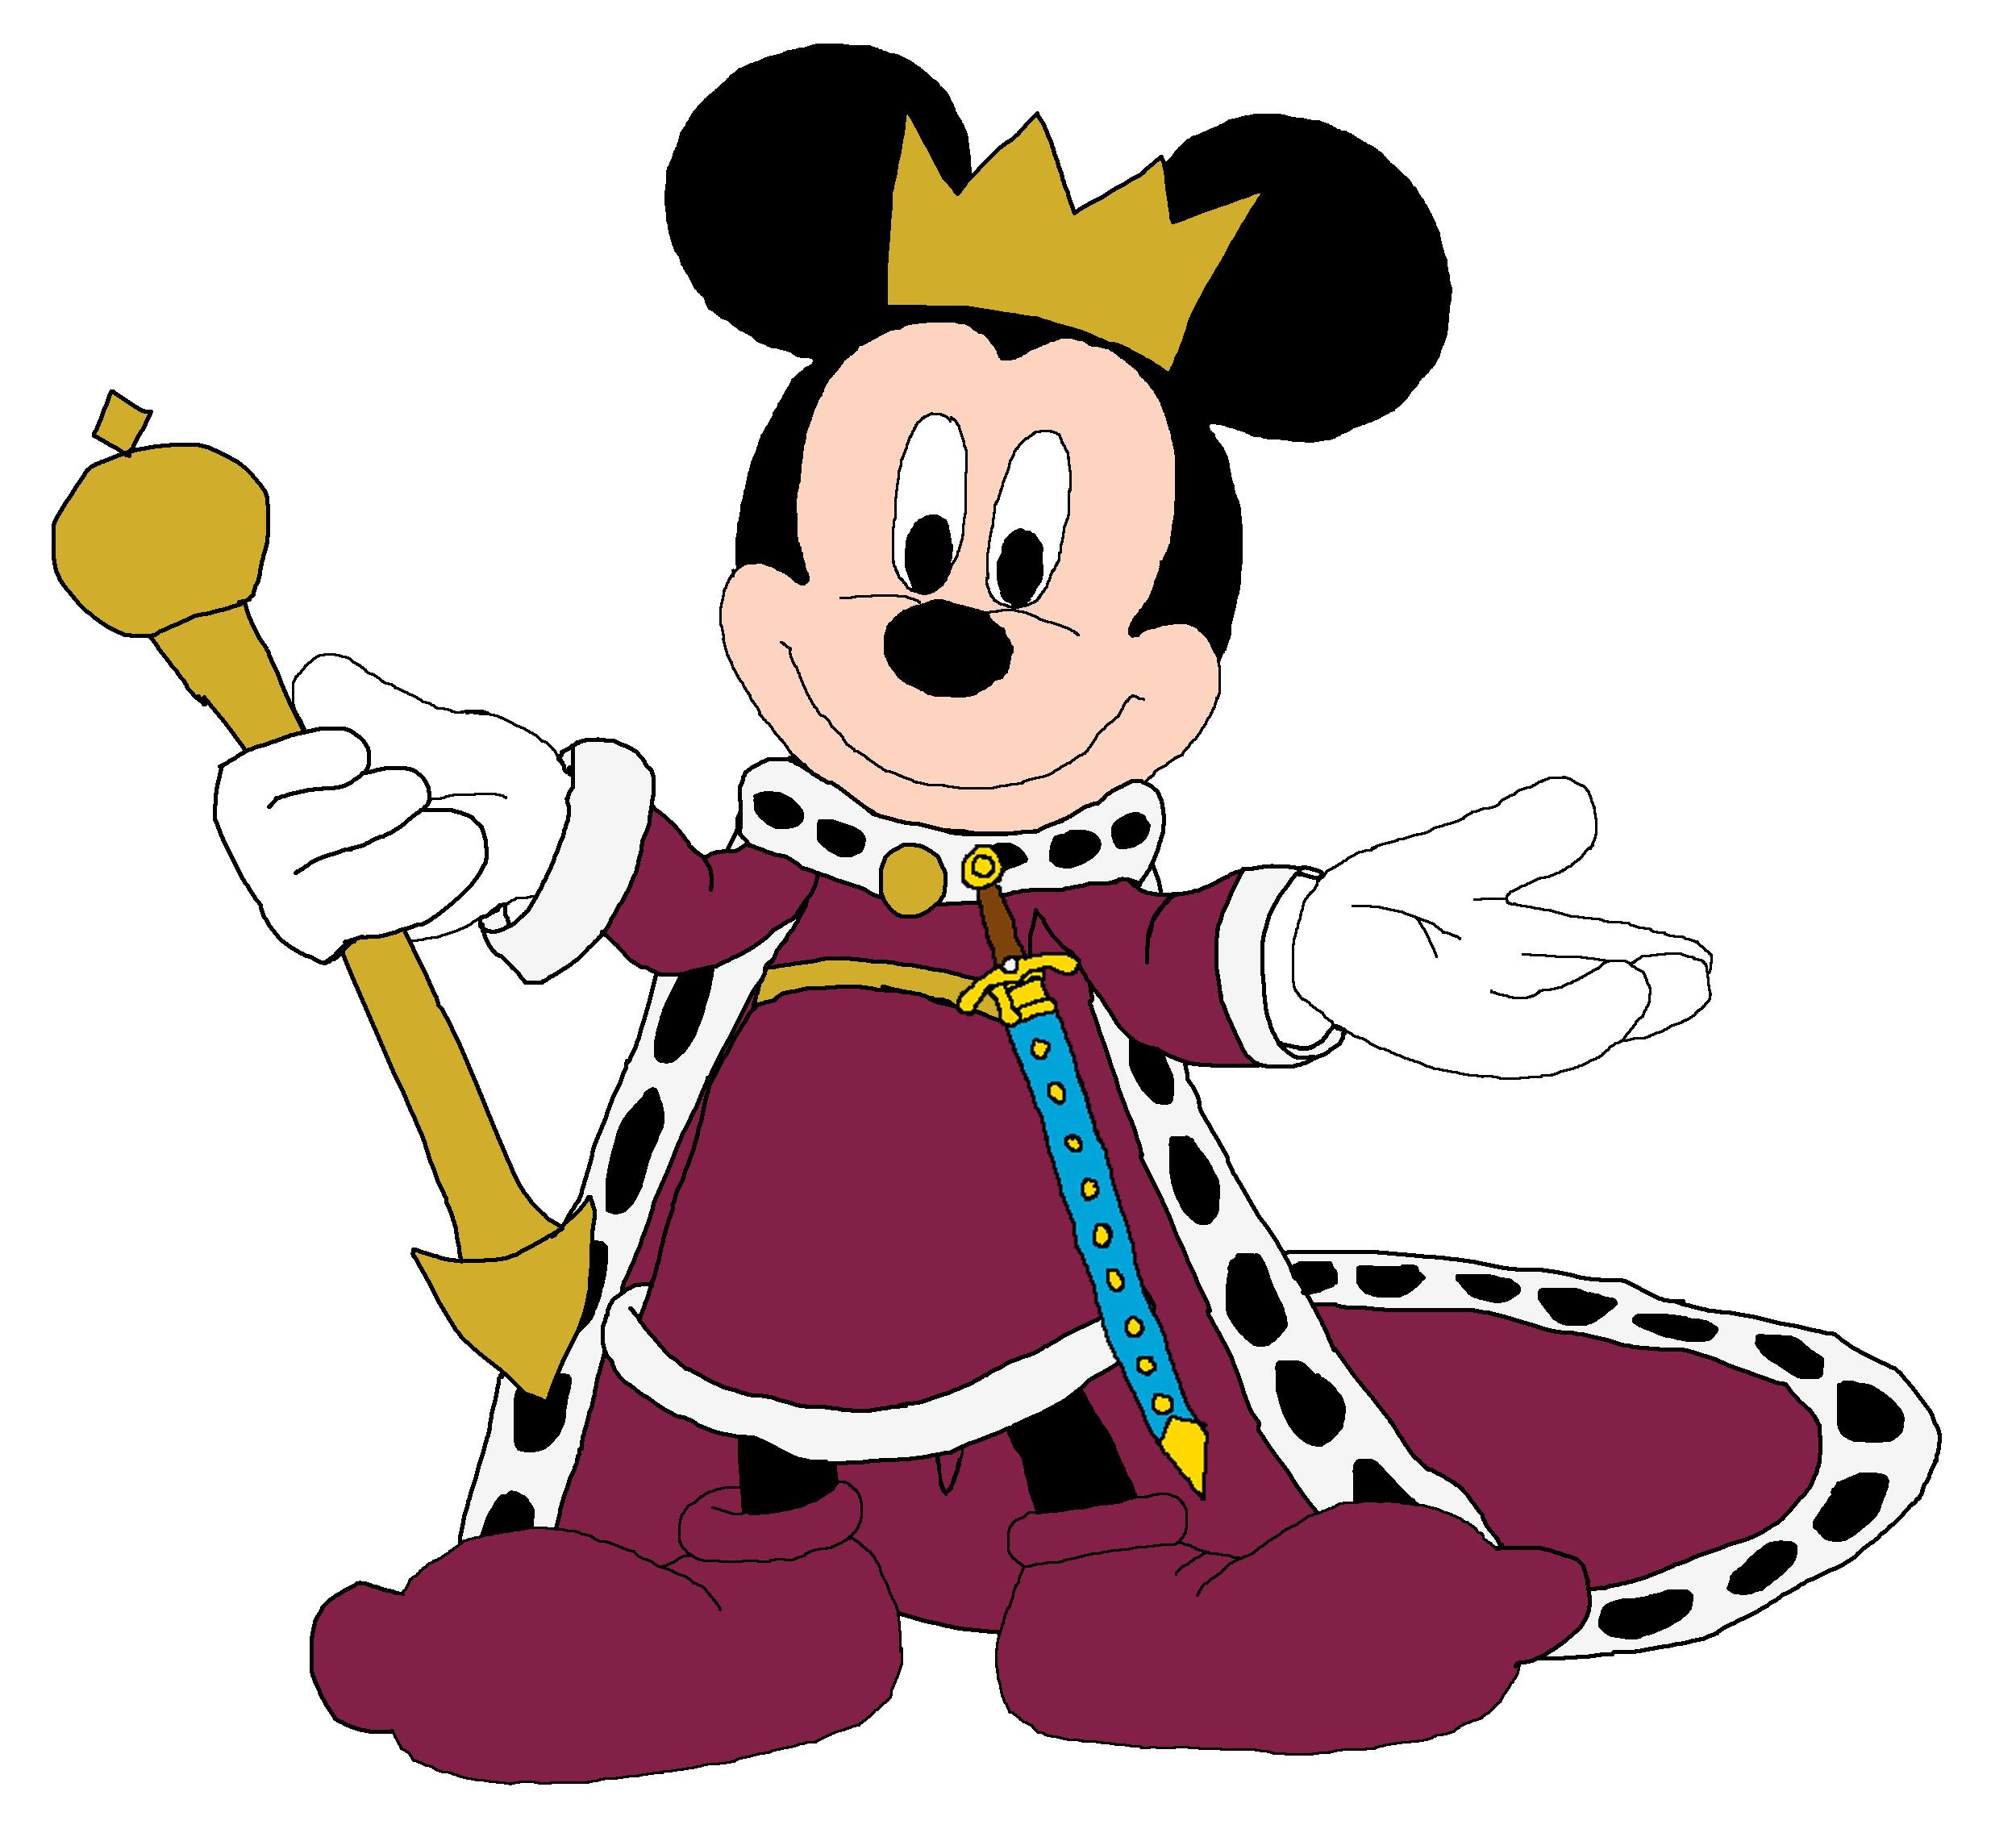 Mickey as King Arthur